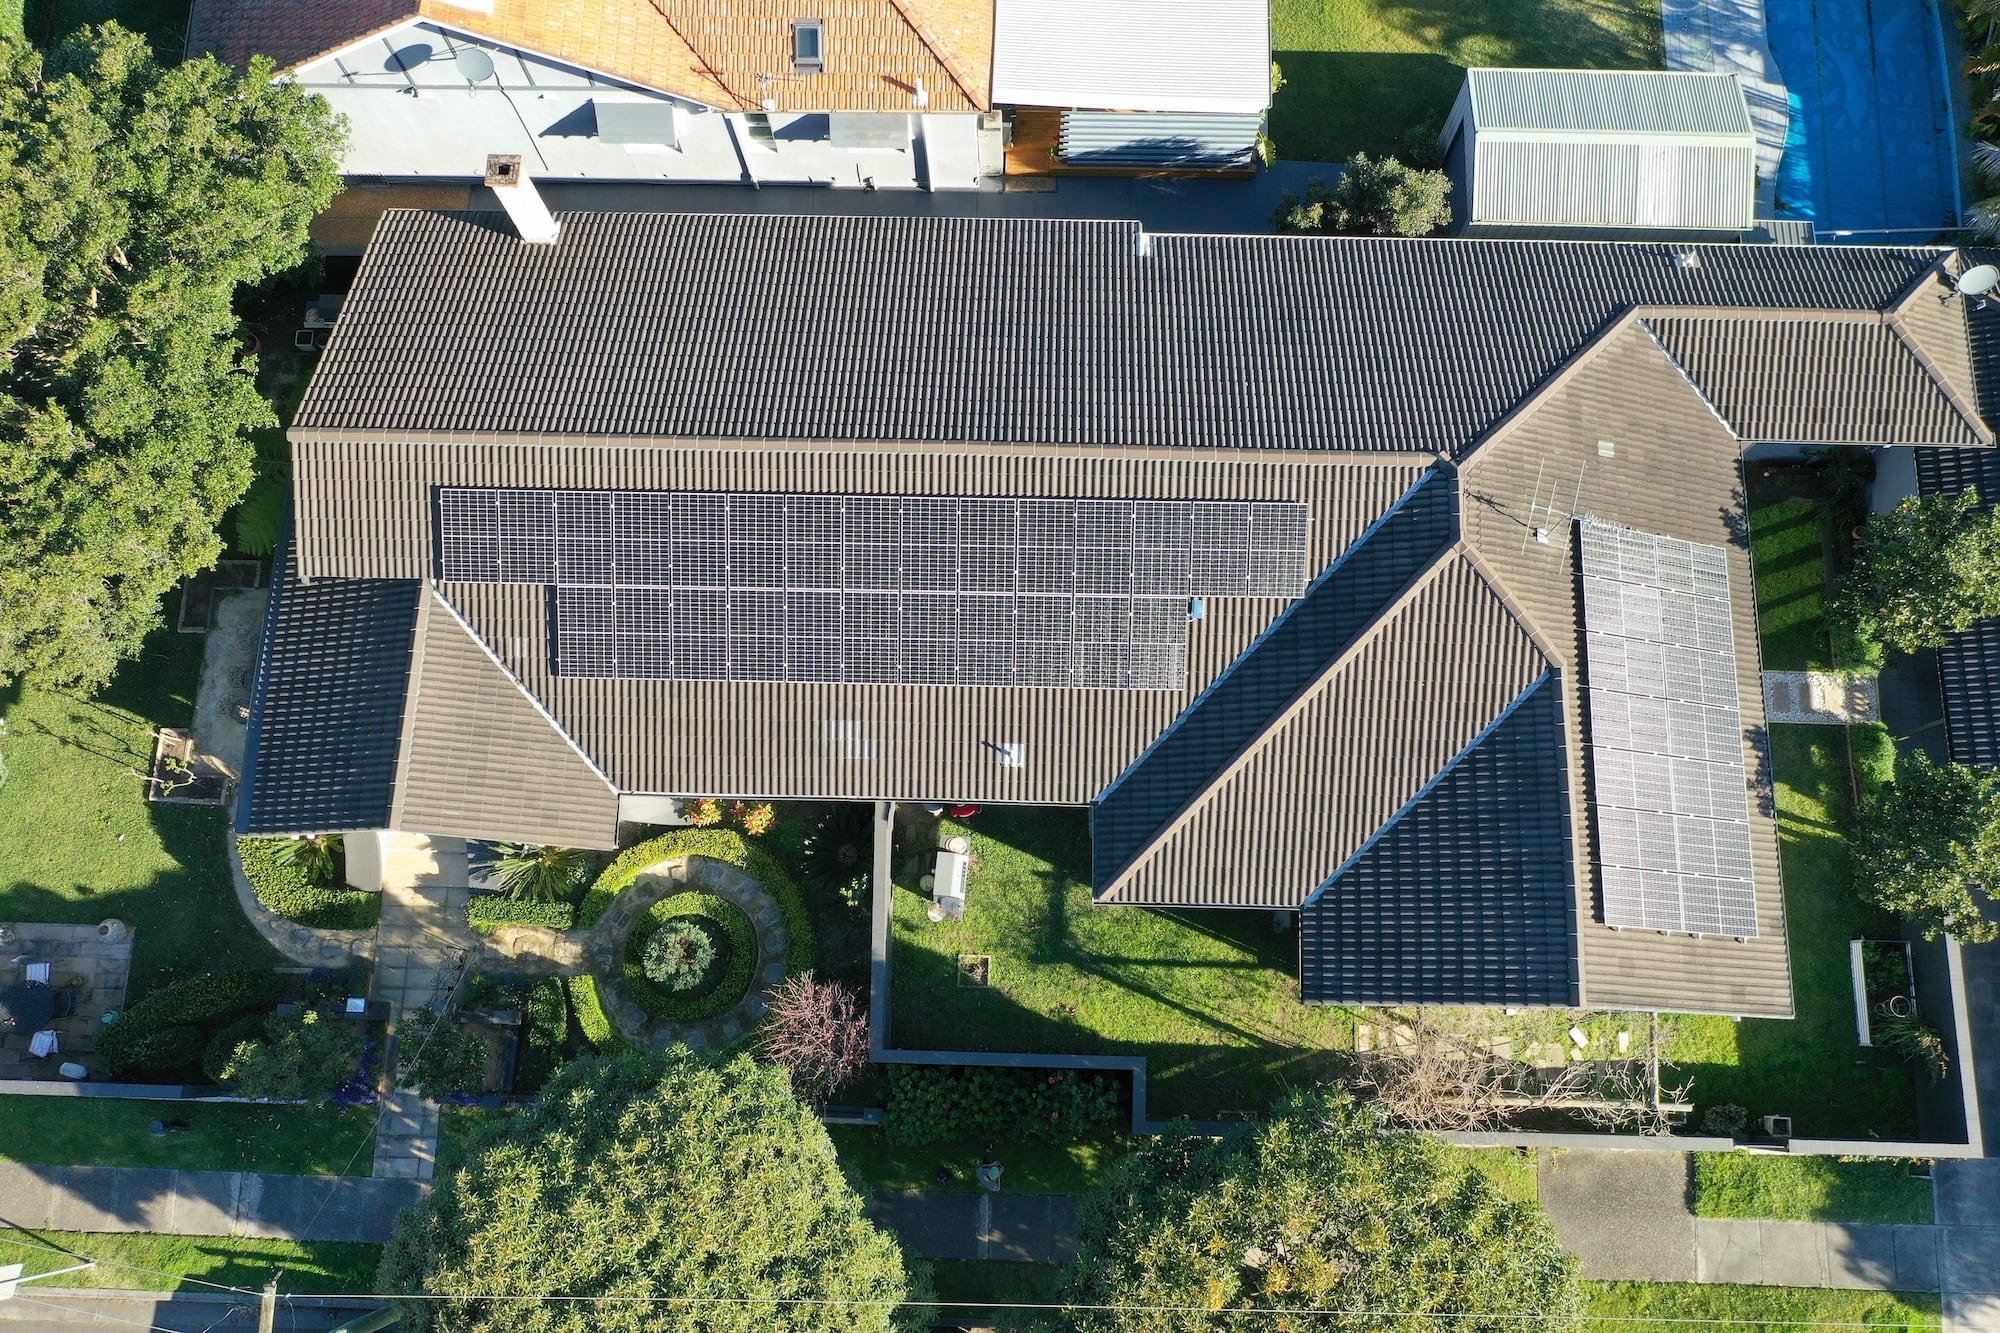 Why Solar? - solar power